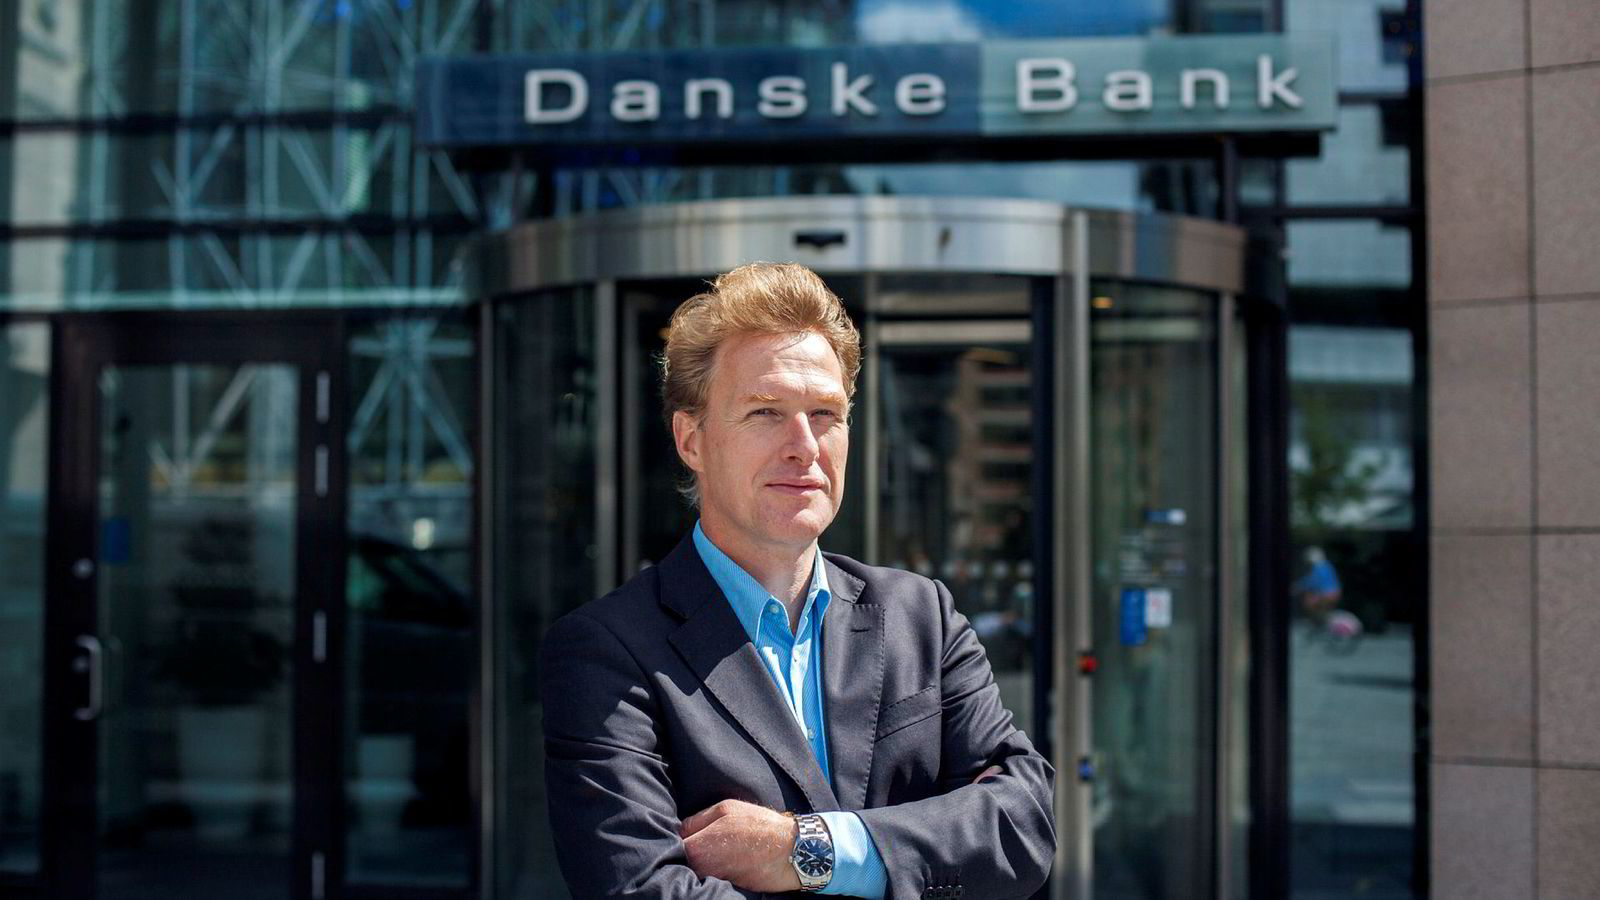 Sjefstrateg Jostein Tvedt i Danske Bank tror de lange rentene vil trekke oppover.